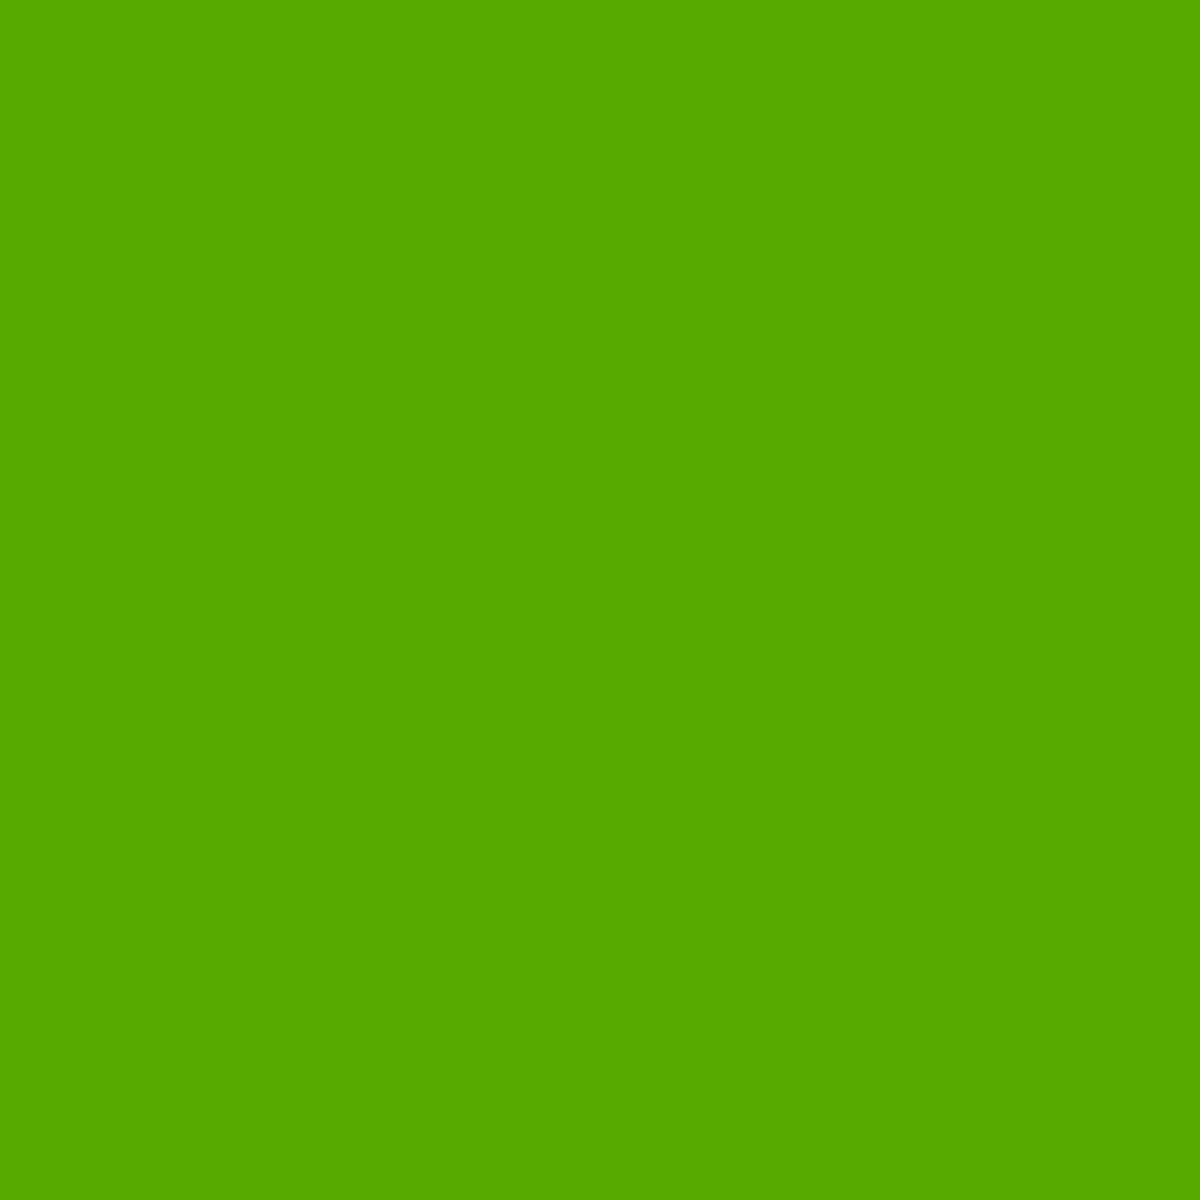 Виниловая самоклеющаяся пленка (глянец) G-3200 (1,06м х45,7м)